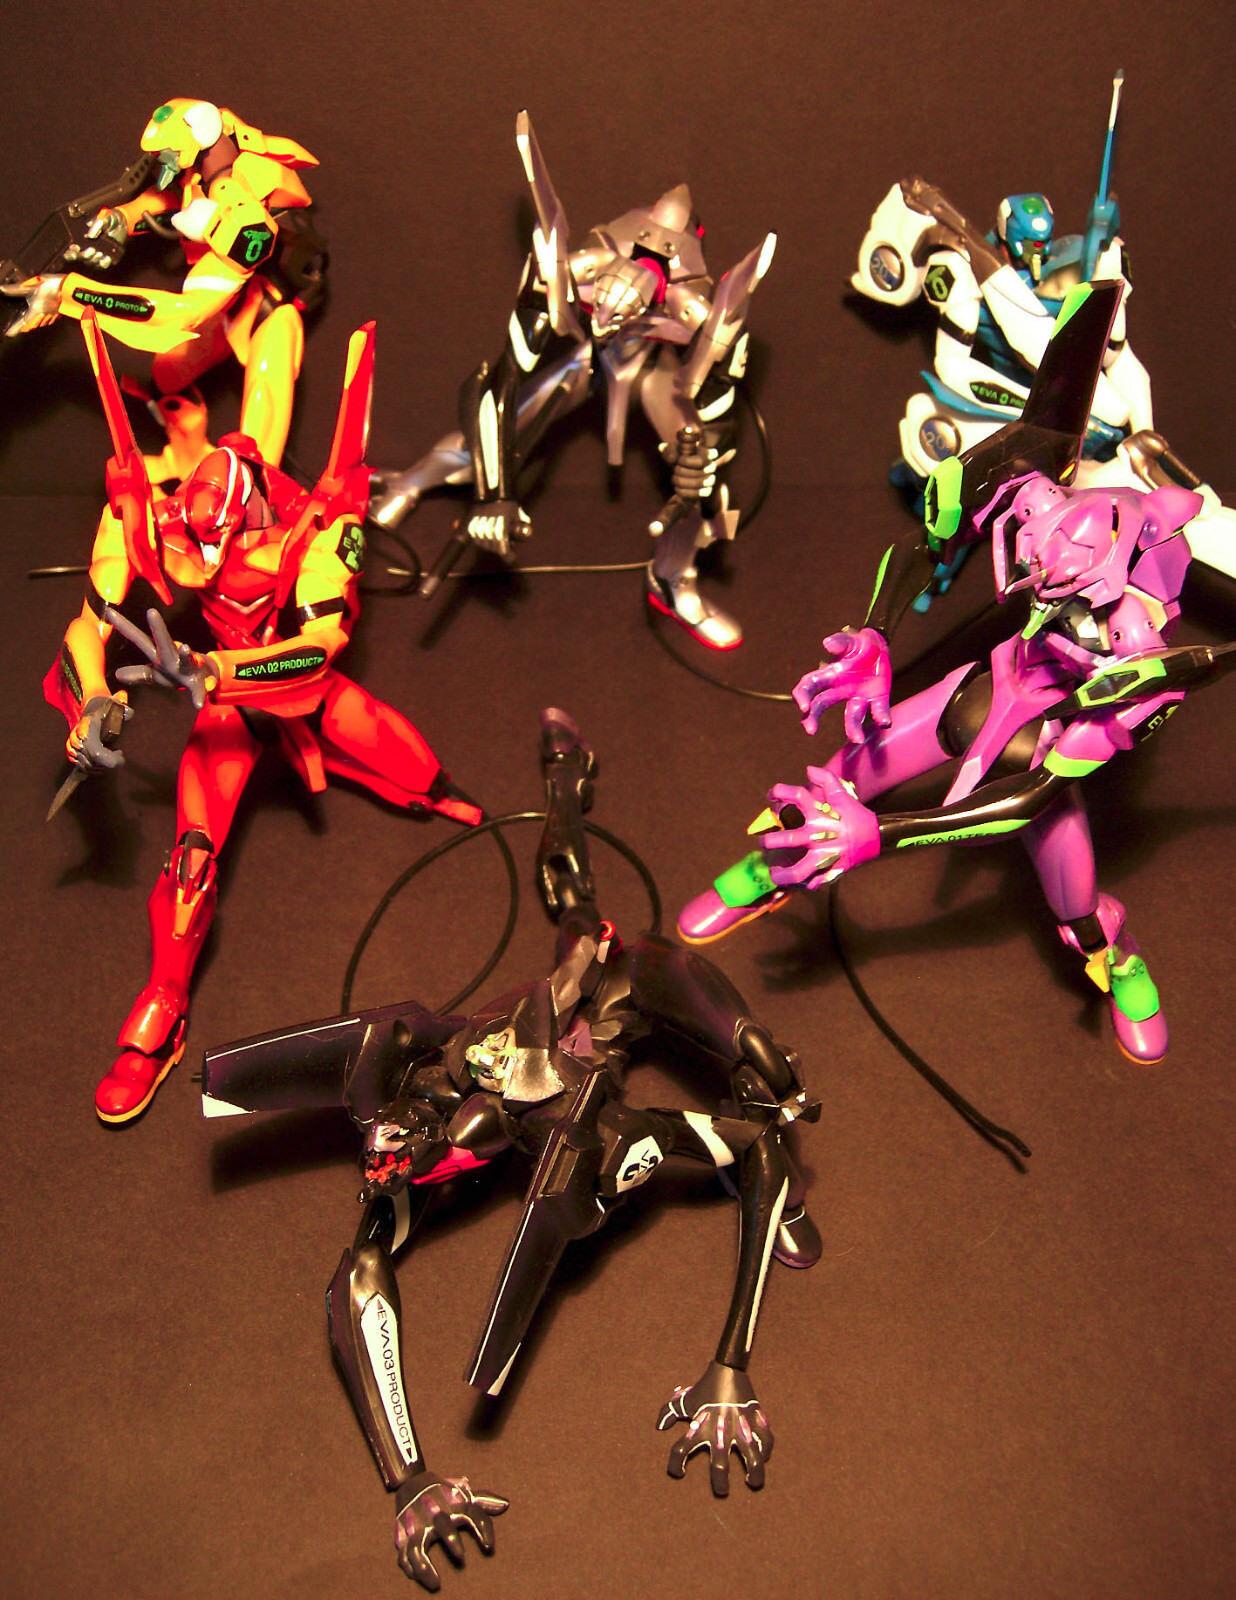 Kaiyodo-Neon Genesis Evangelion Production Model-Set of 6 No Original boxes